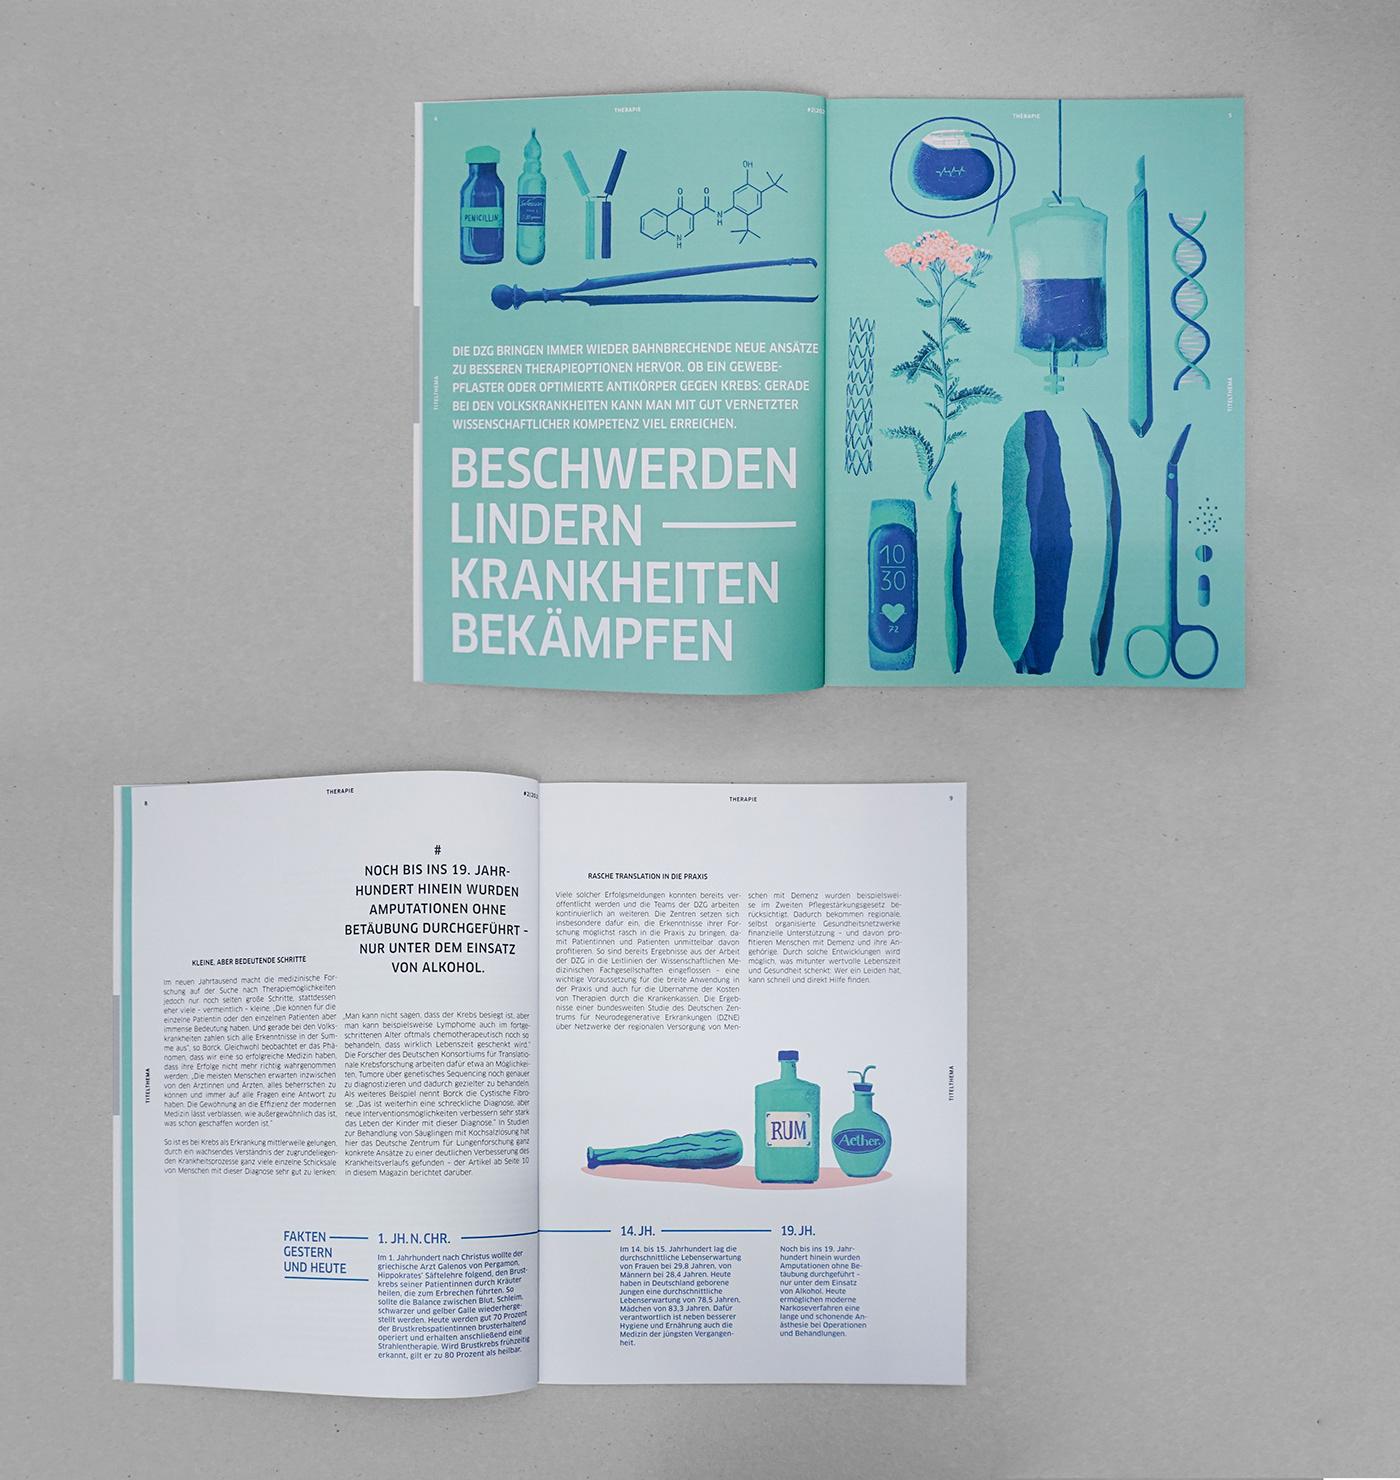 corona editorial design  Health ILLUSTRATION  magazine science therapy virus vaccine